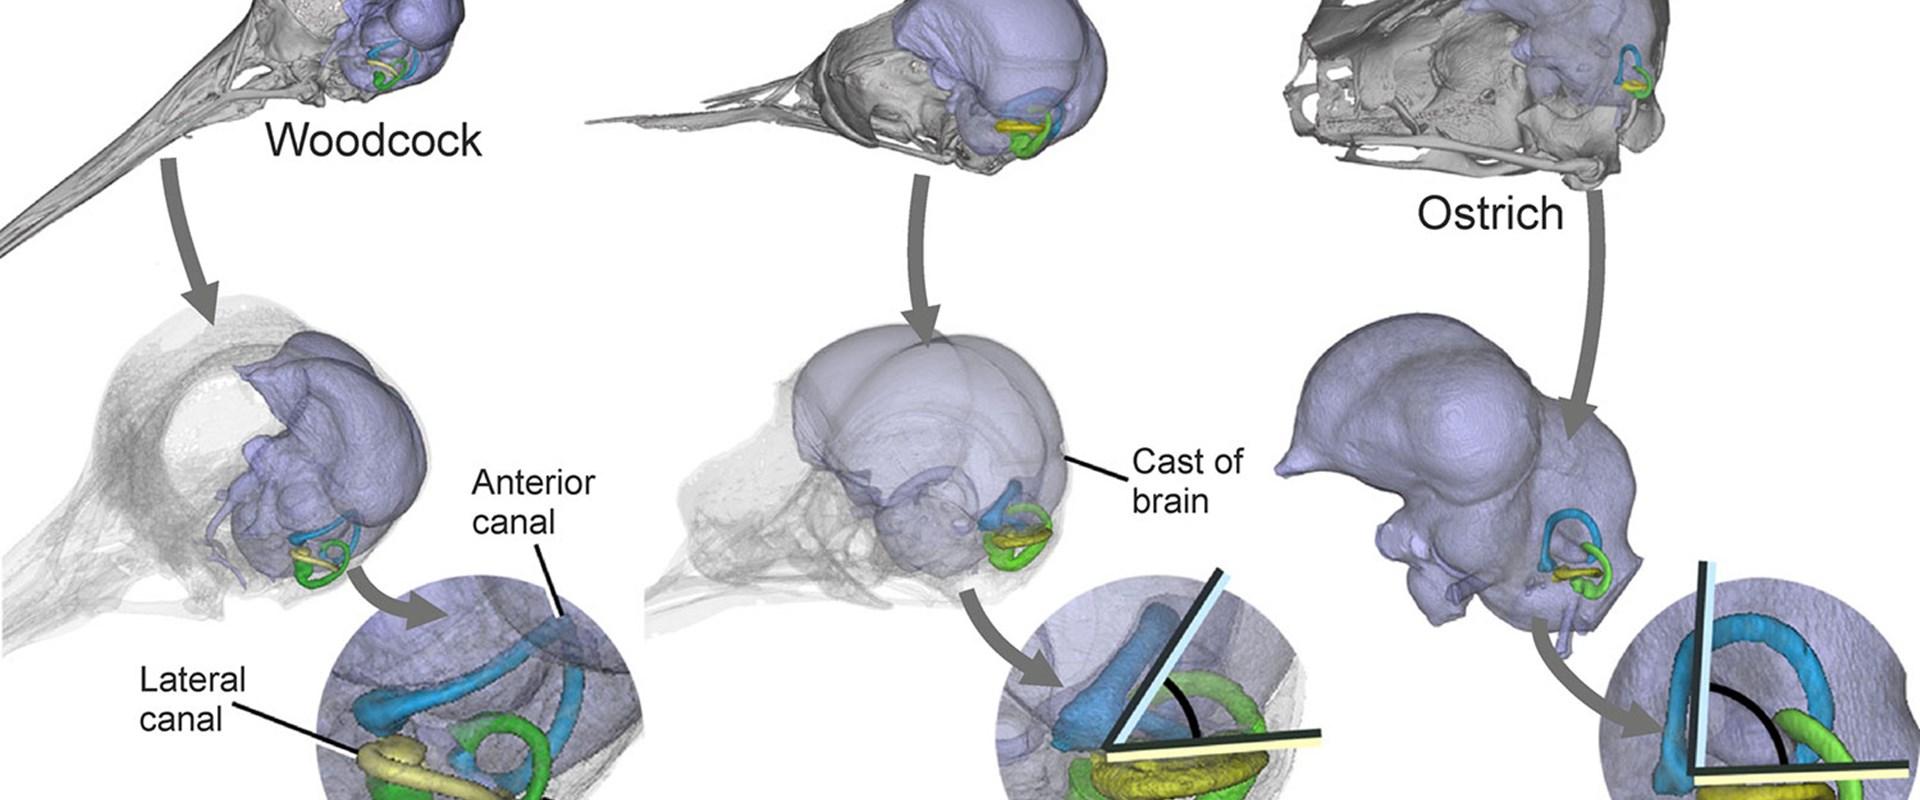 the birds analysis